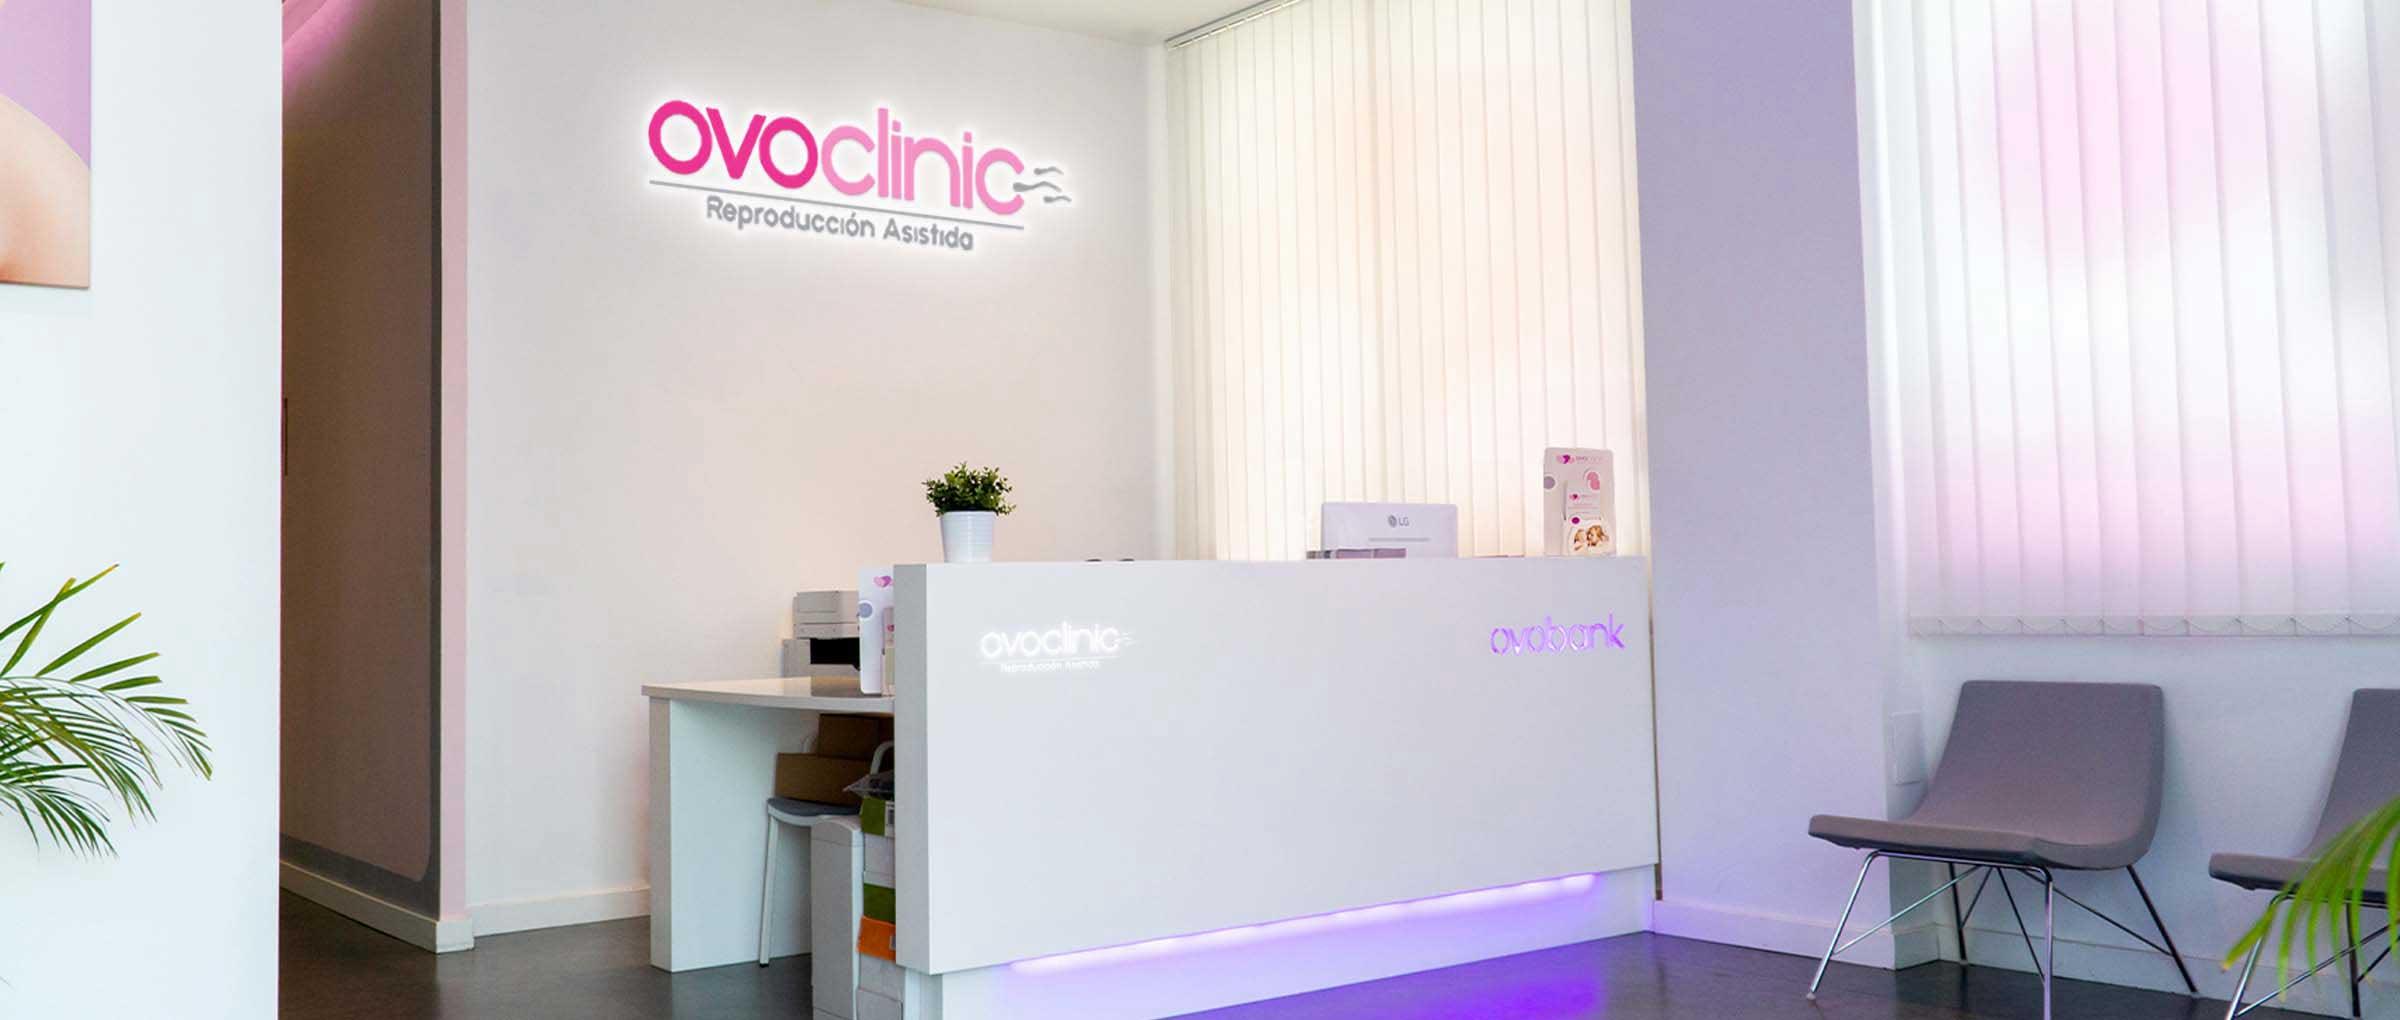 Recepción de Ovoclinic Málaga